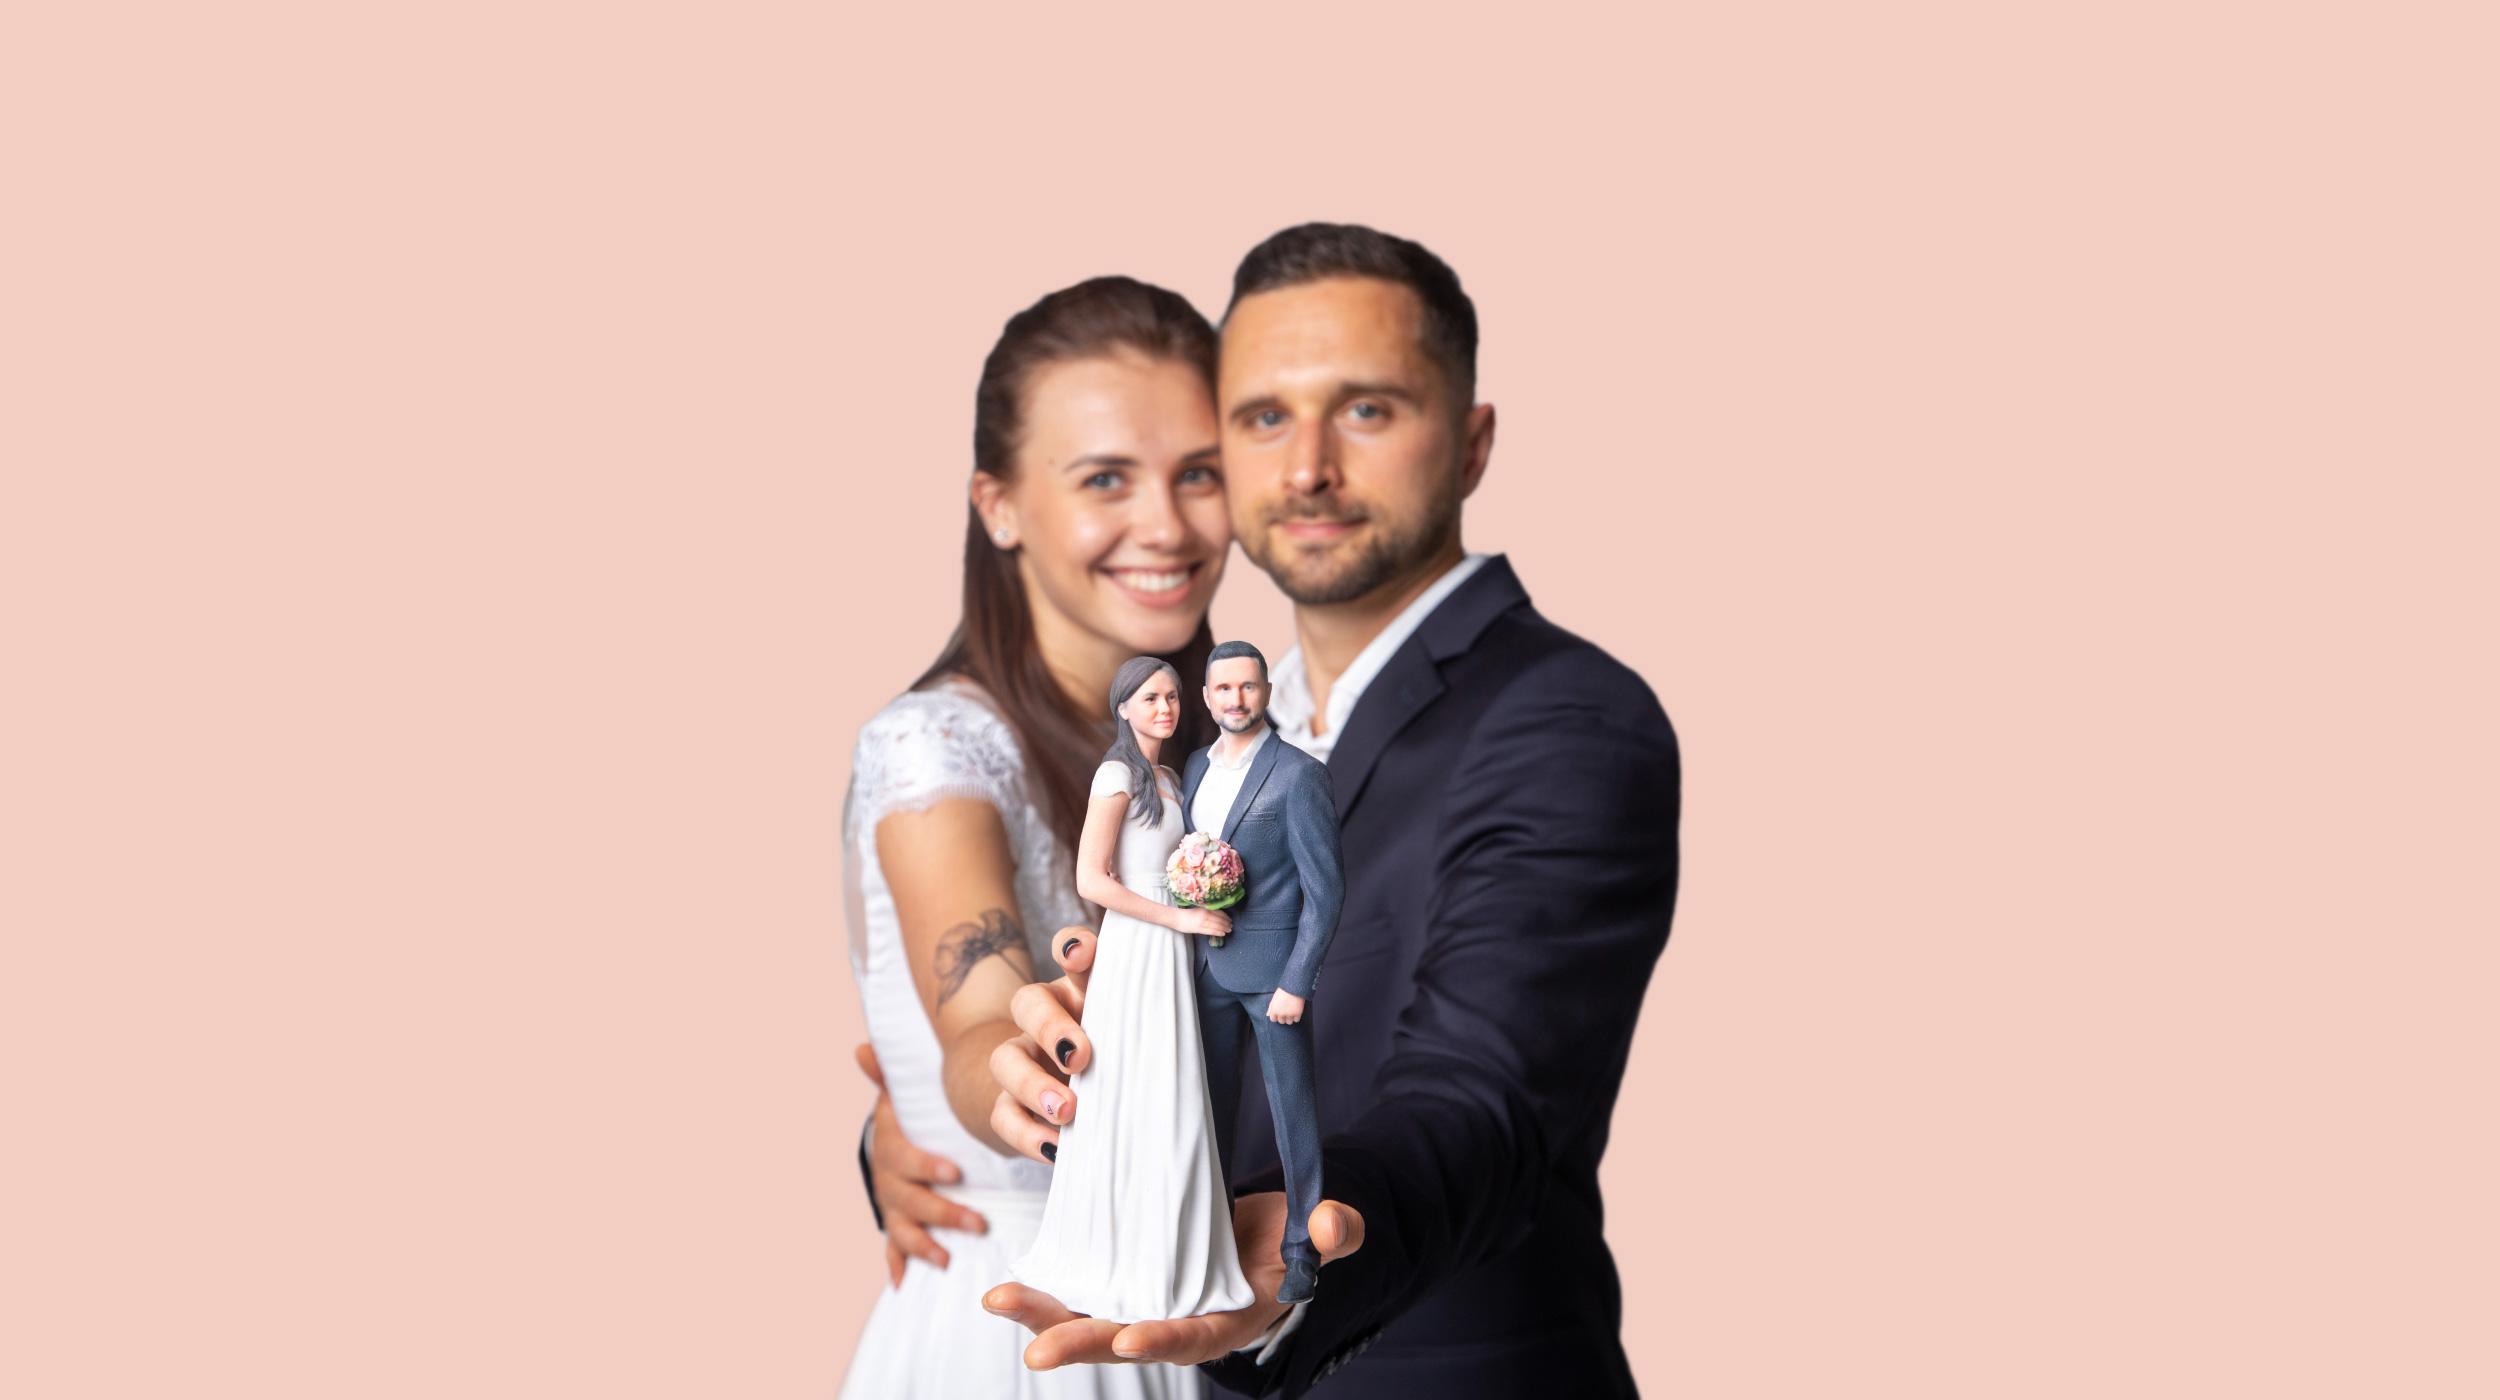 Hochzeit 3D-Fotosession